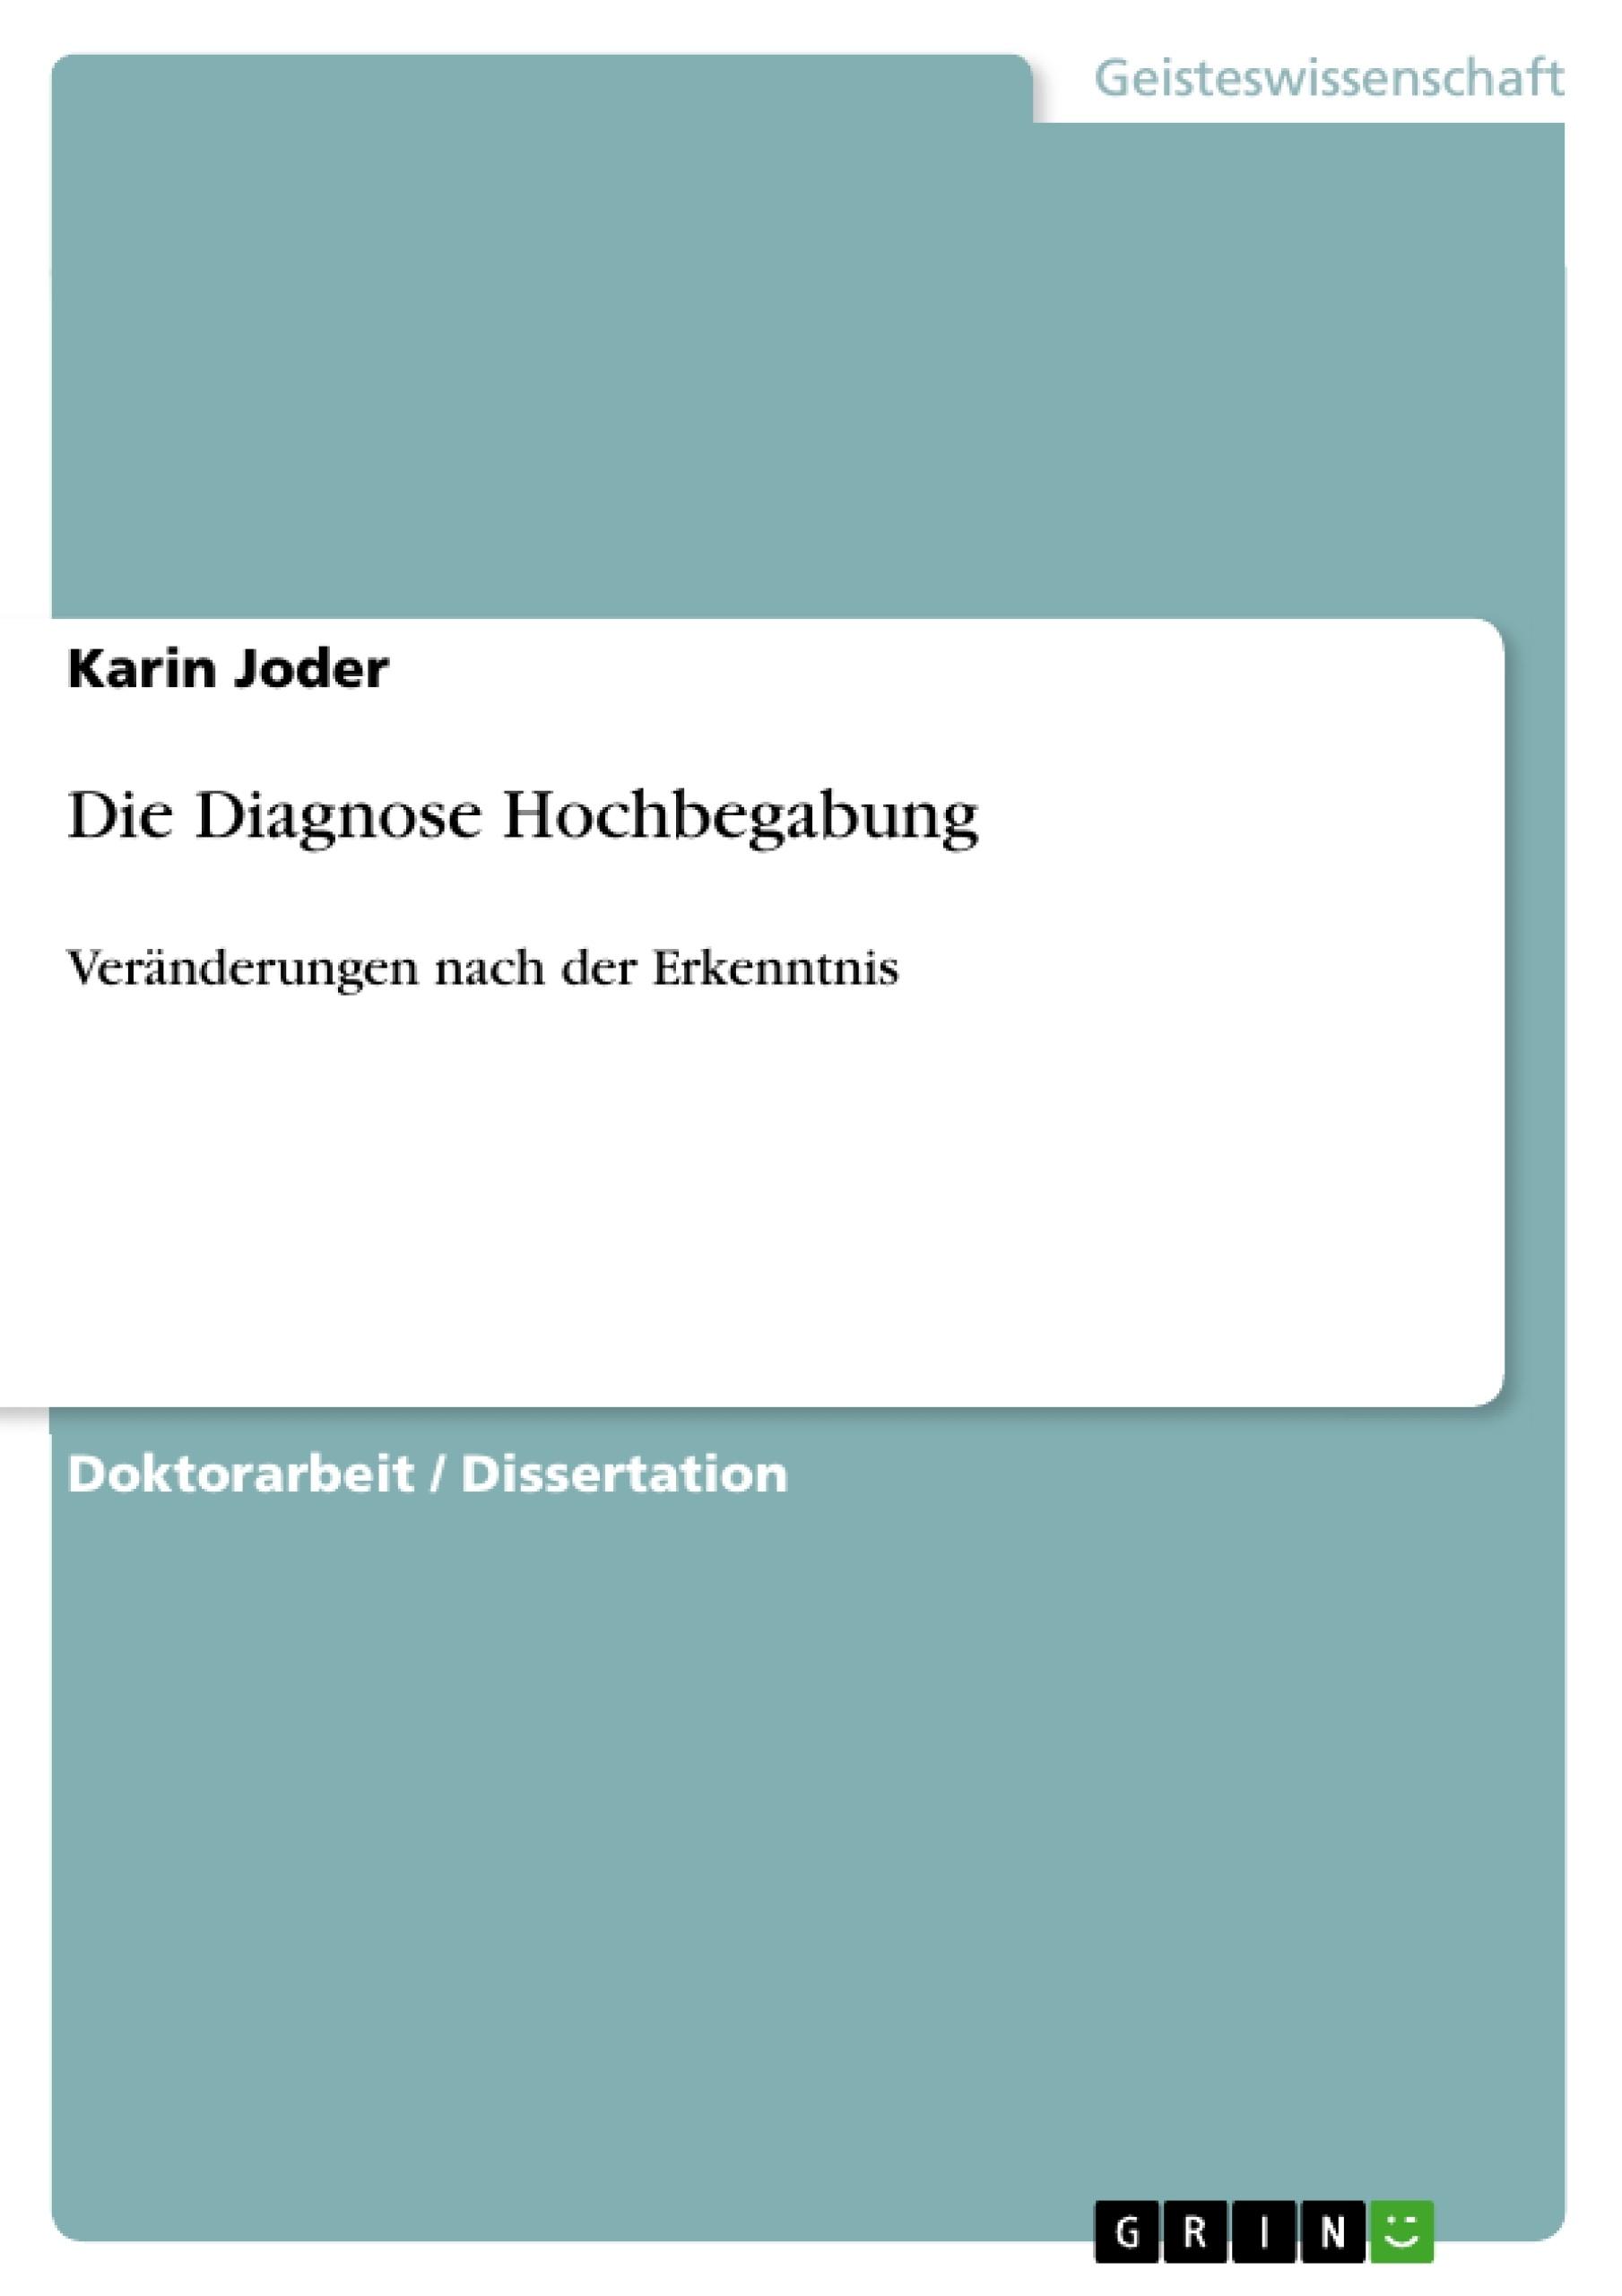 Titel: Die Diagnose Hochbegabung